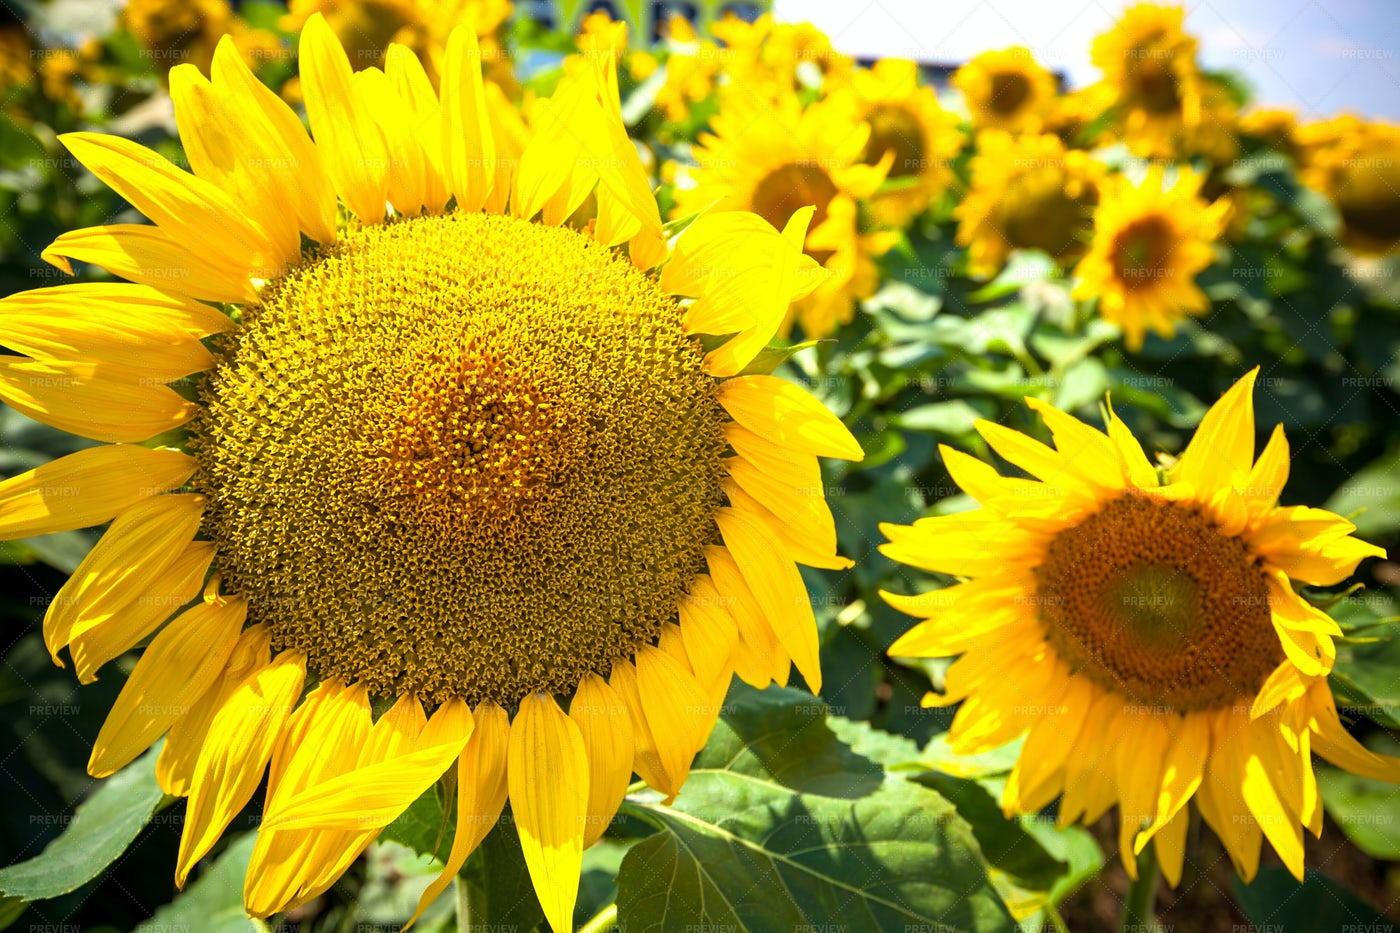 Sunflowers Field: Stock Photos